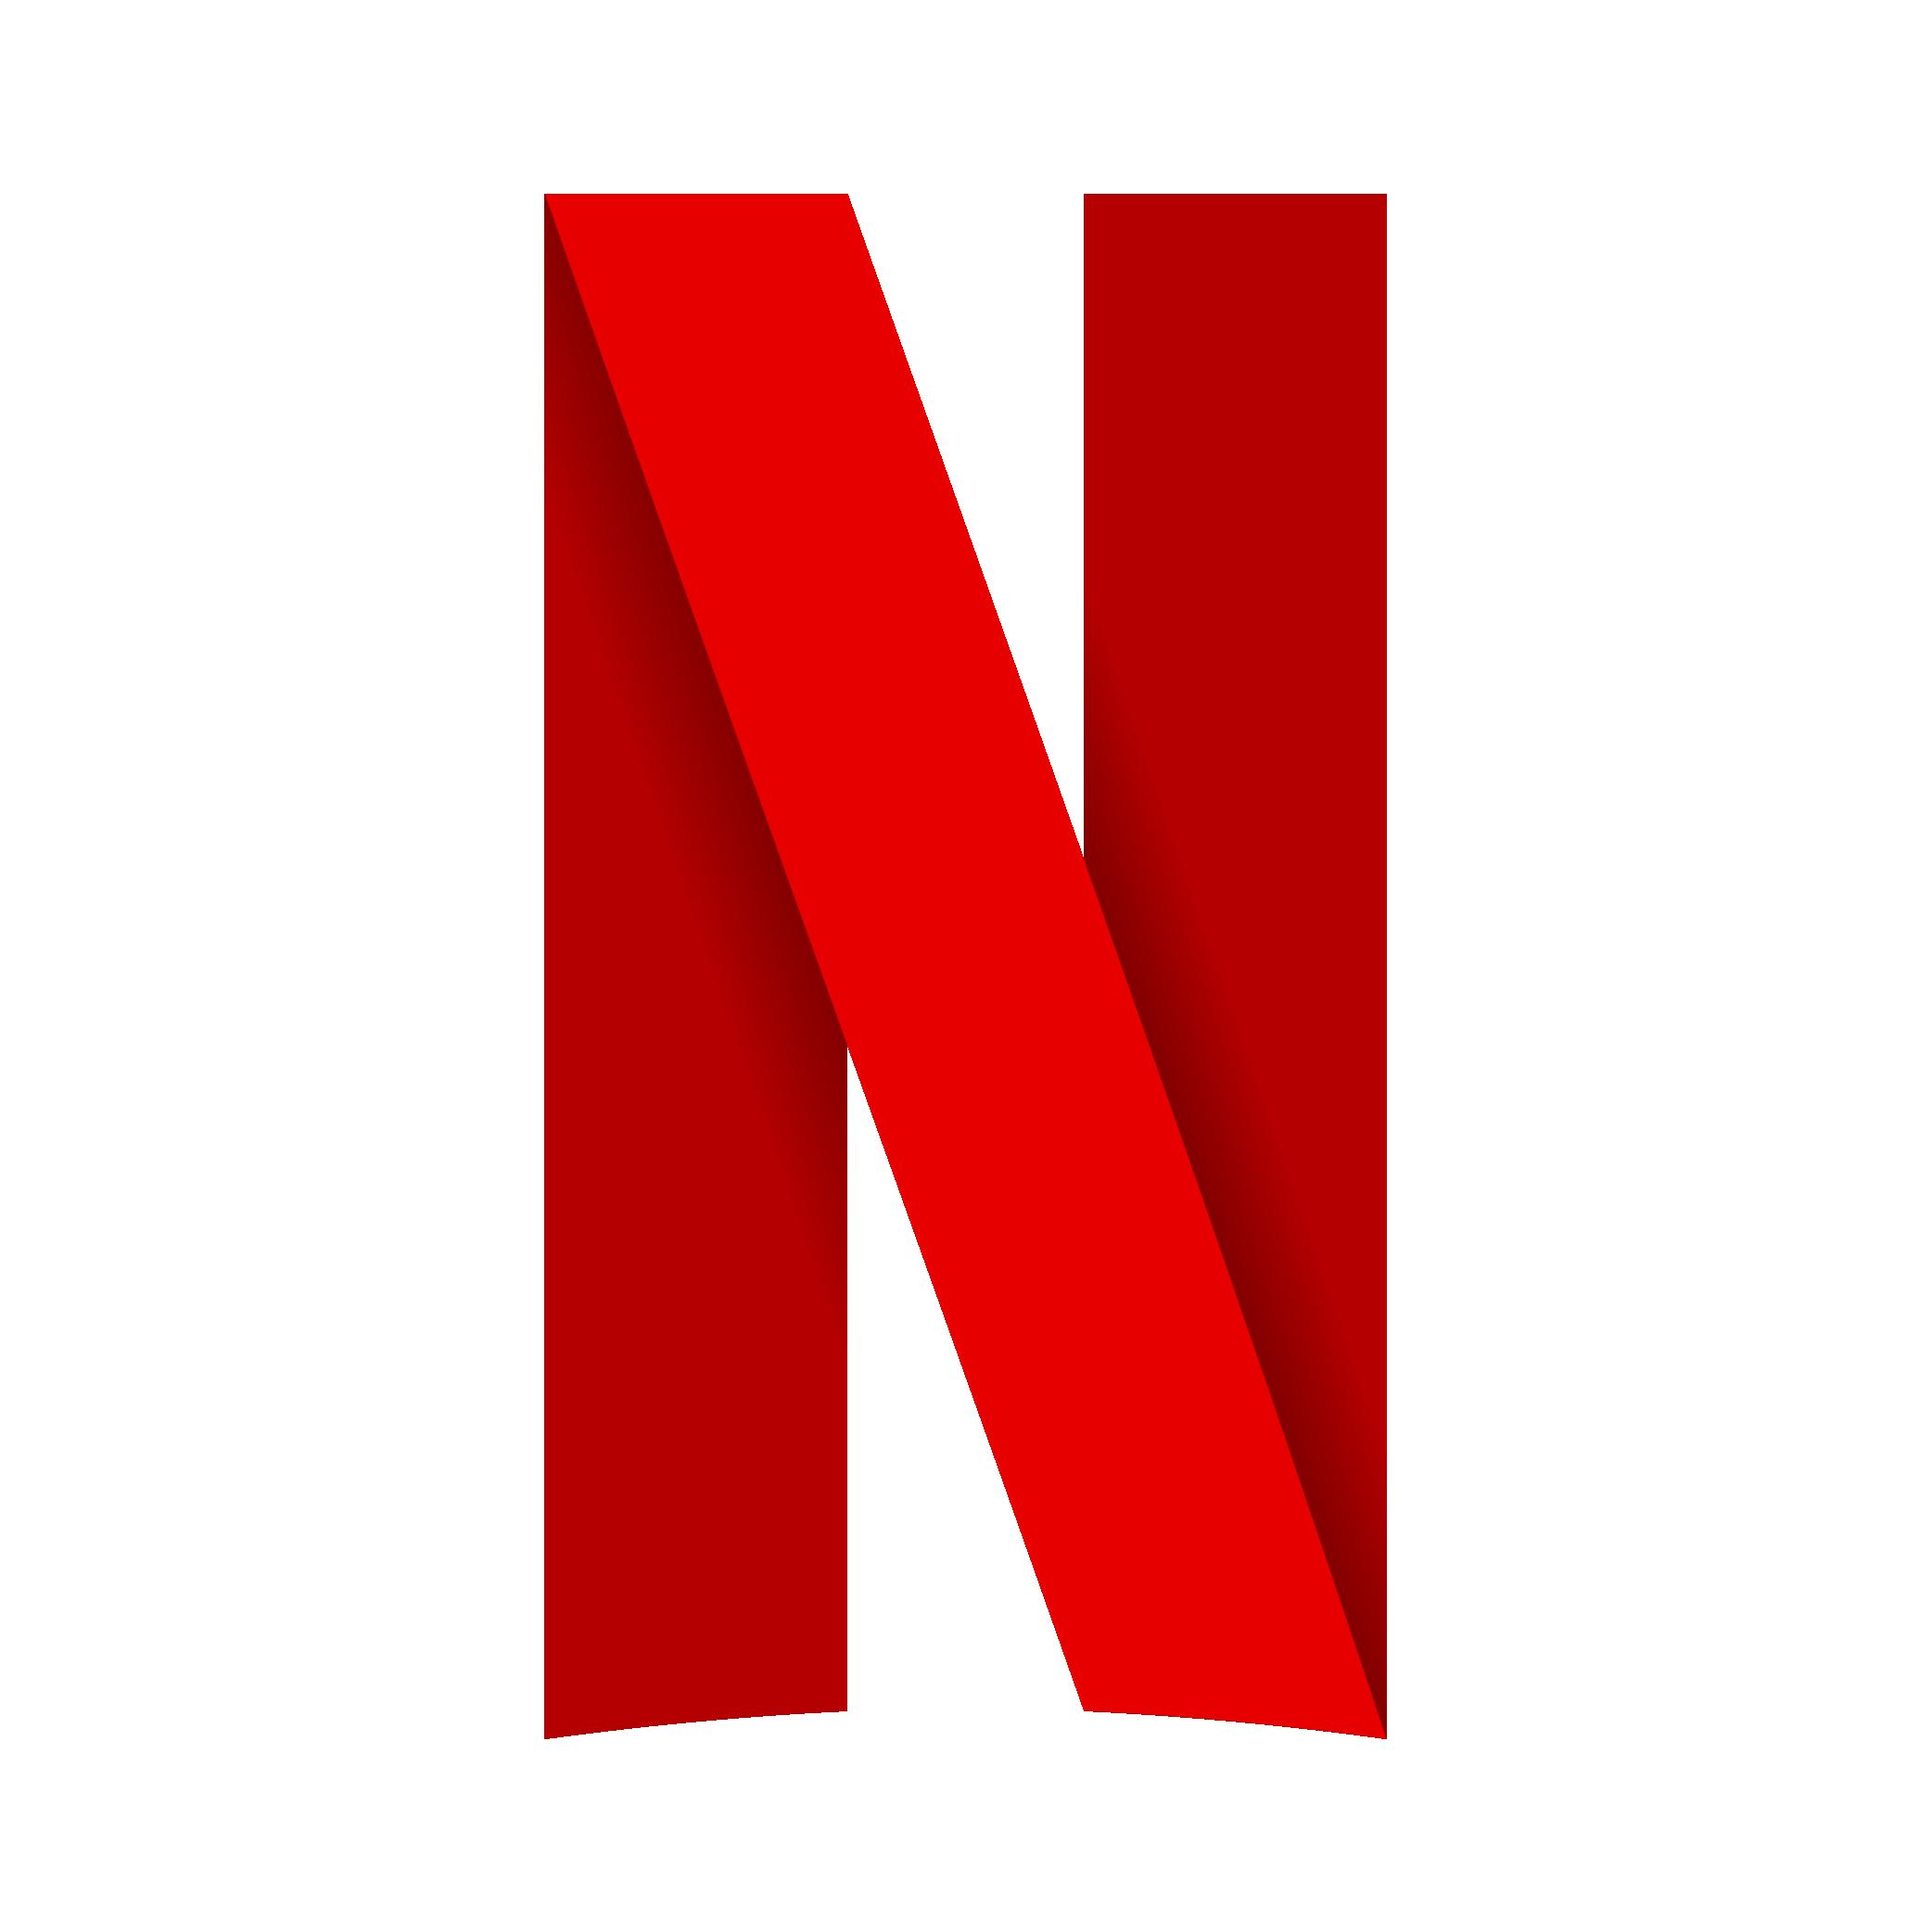 logo de netflix clipart 10 free Cliparts | Download images ...